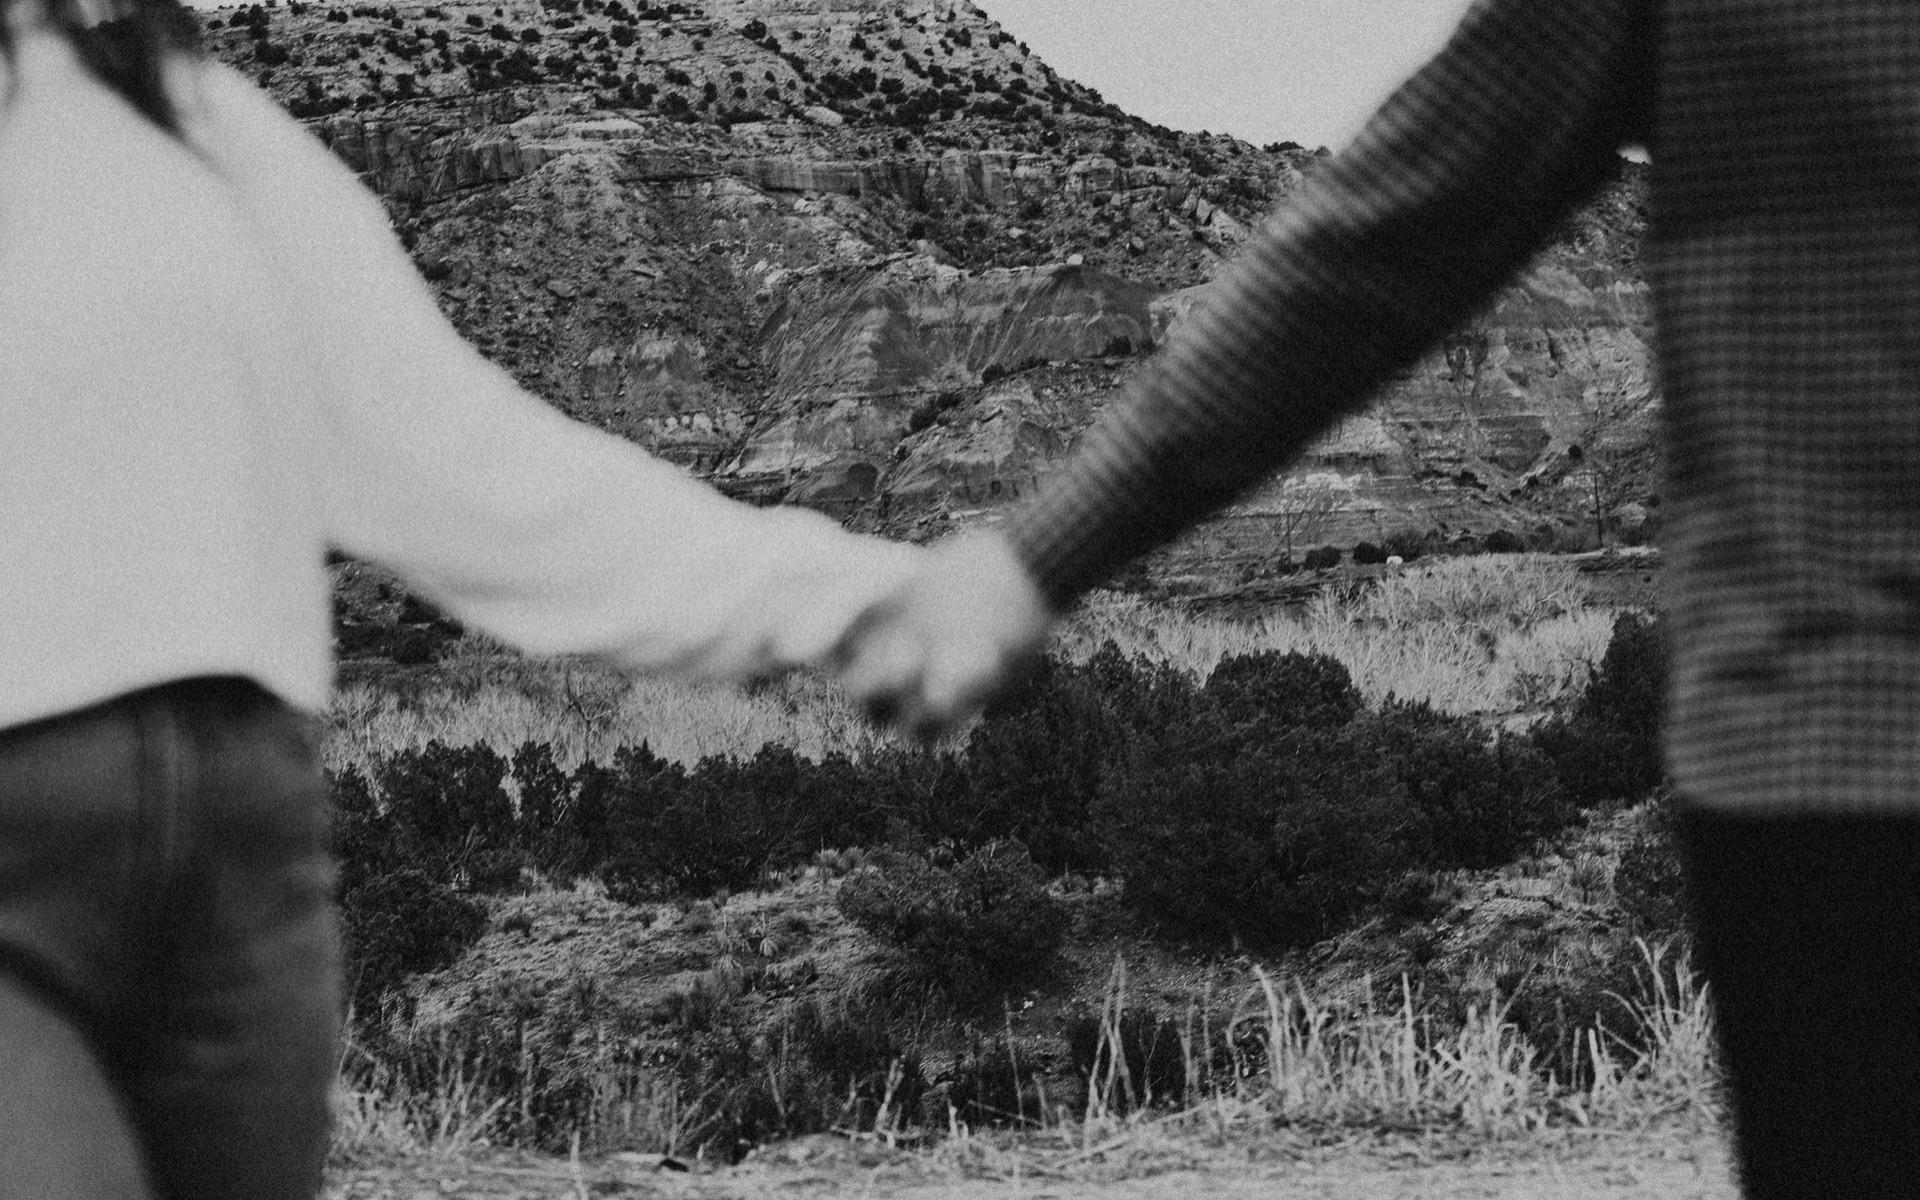 Palo-Duro-Canyon-Klayne-photography-brown-1-of-1-2-large